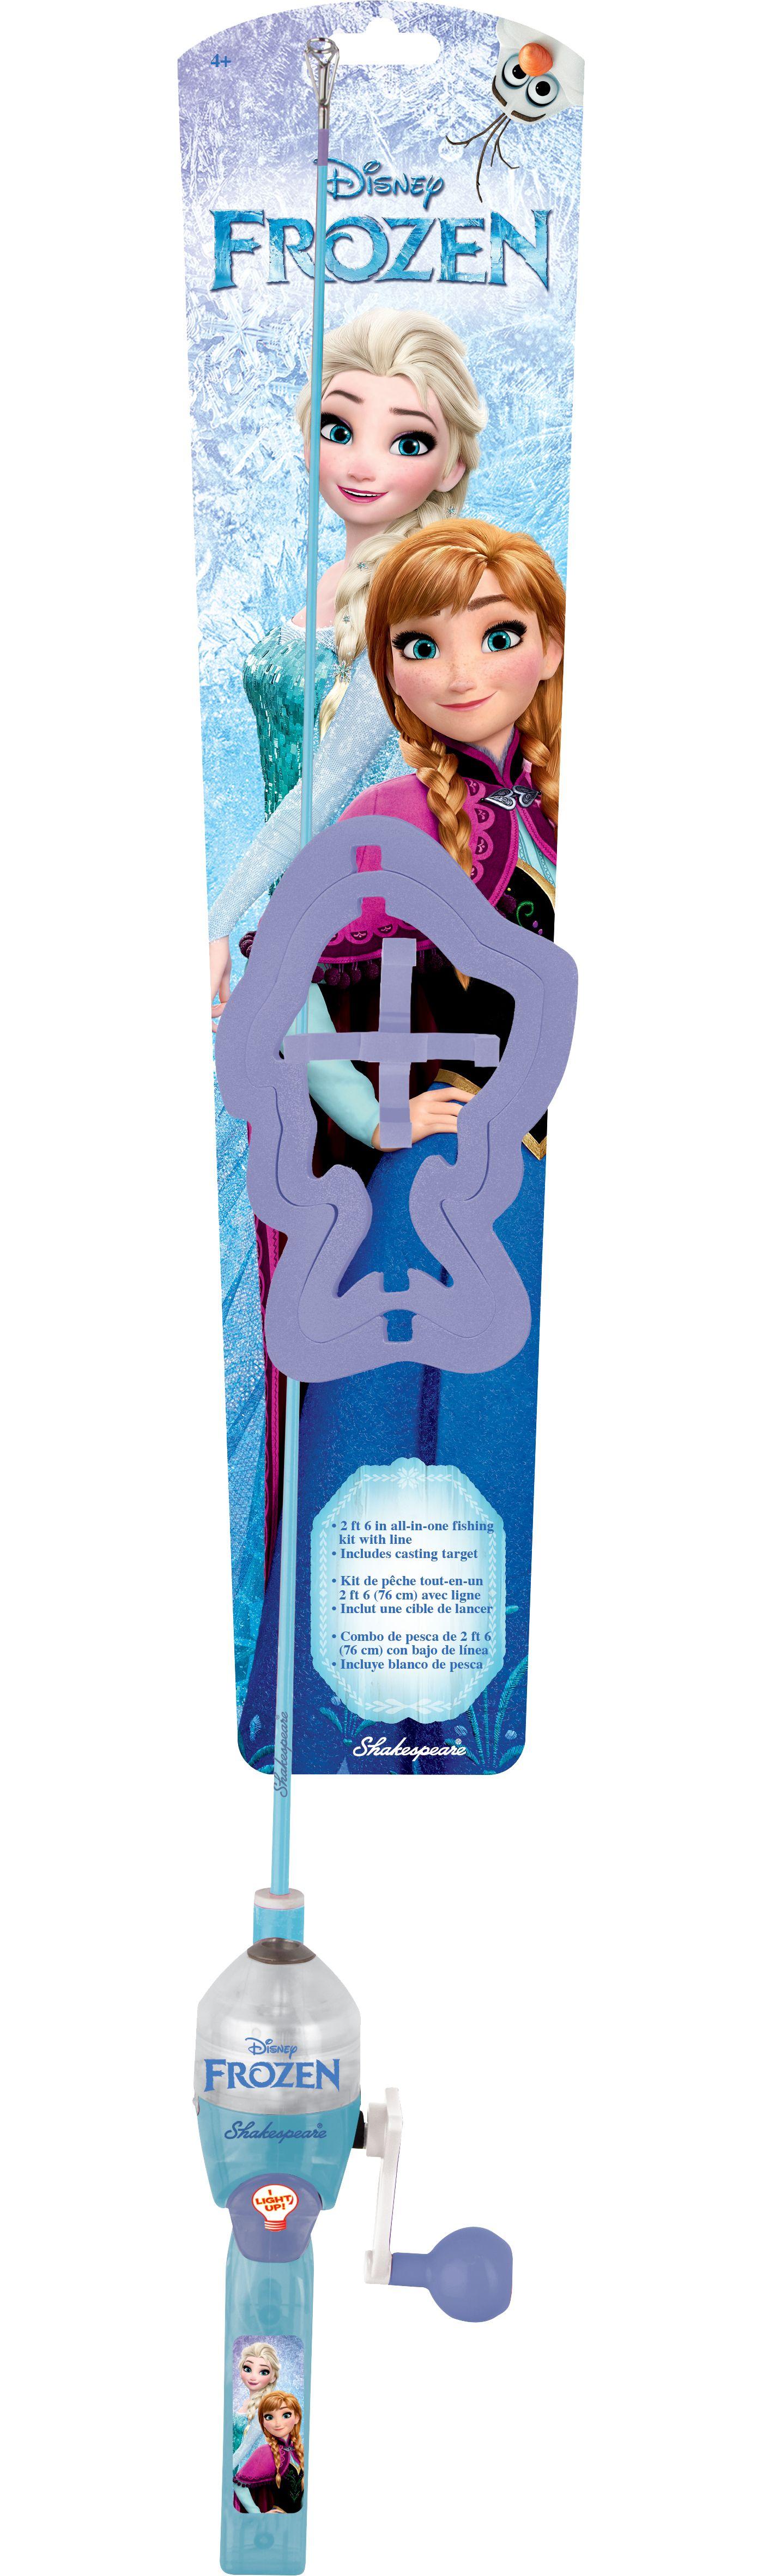 Shakespeare Disney Frozen Lighted Spincast Combo Kit